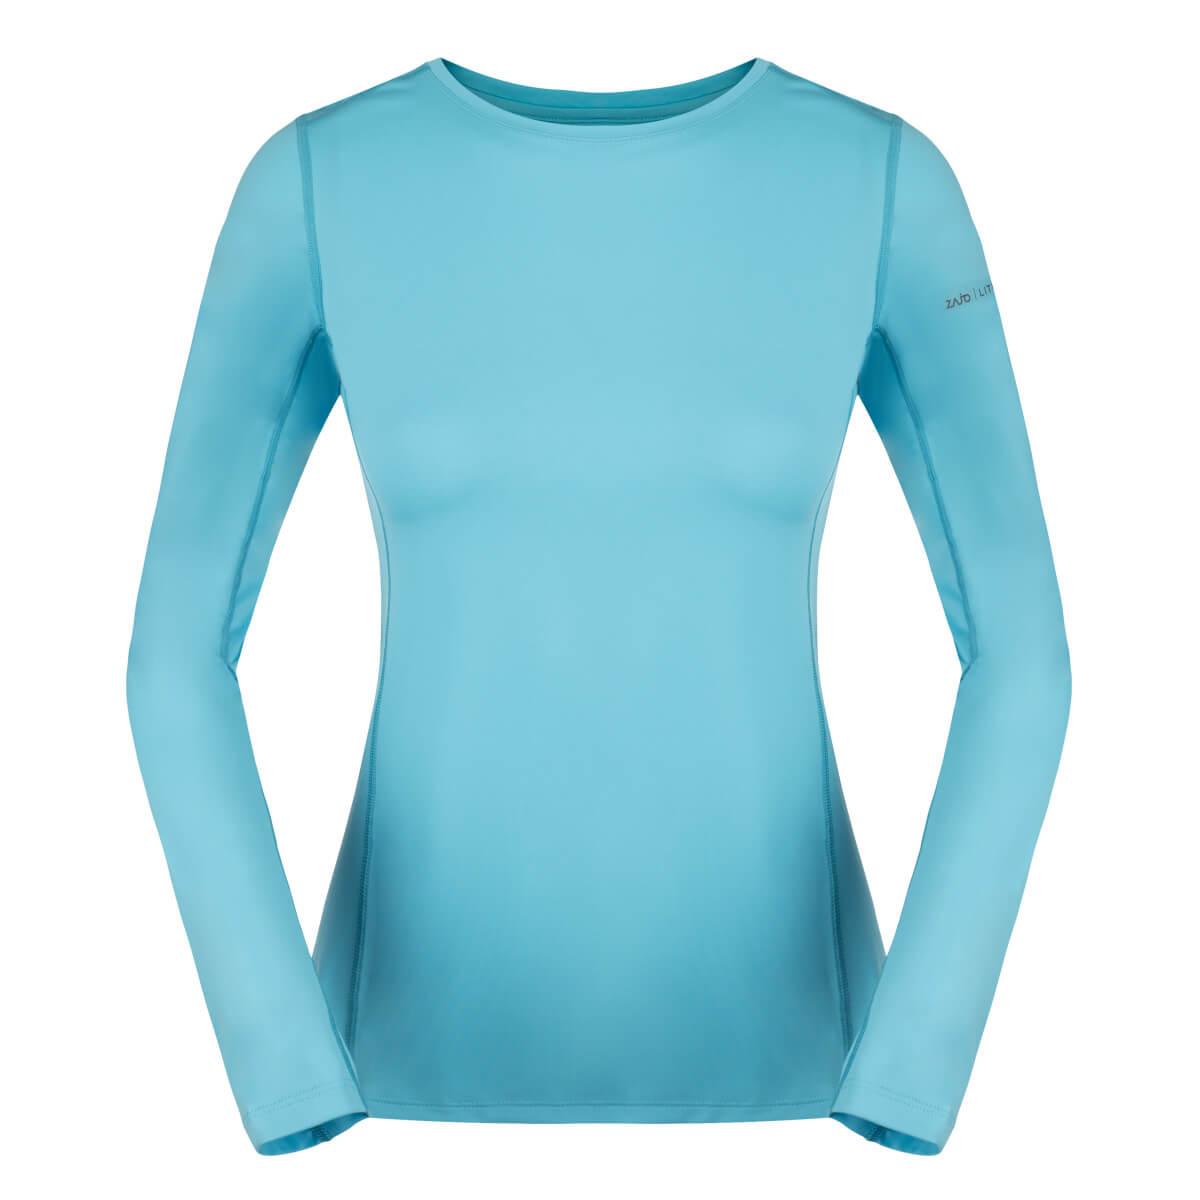 ZAJO Litio T-shirt LS Bluefish dámske tričko - veľkosť XS